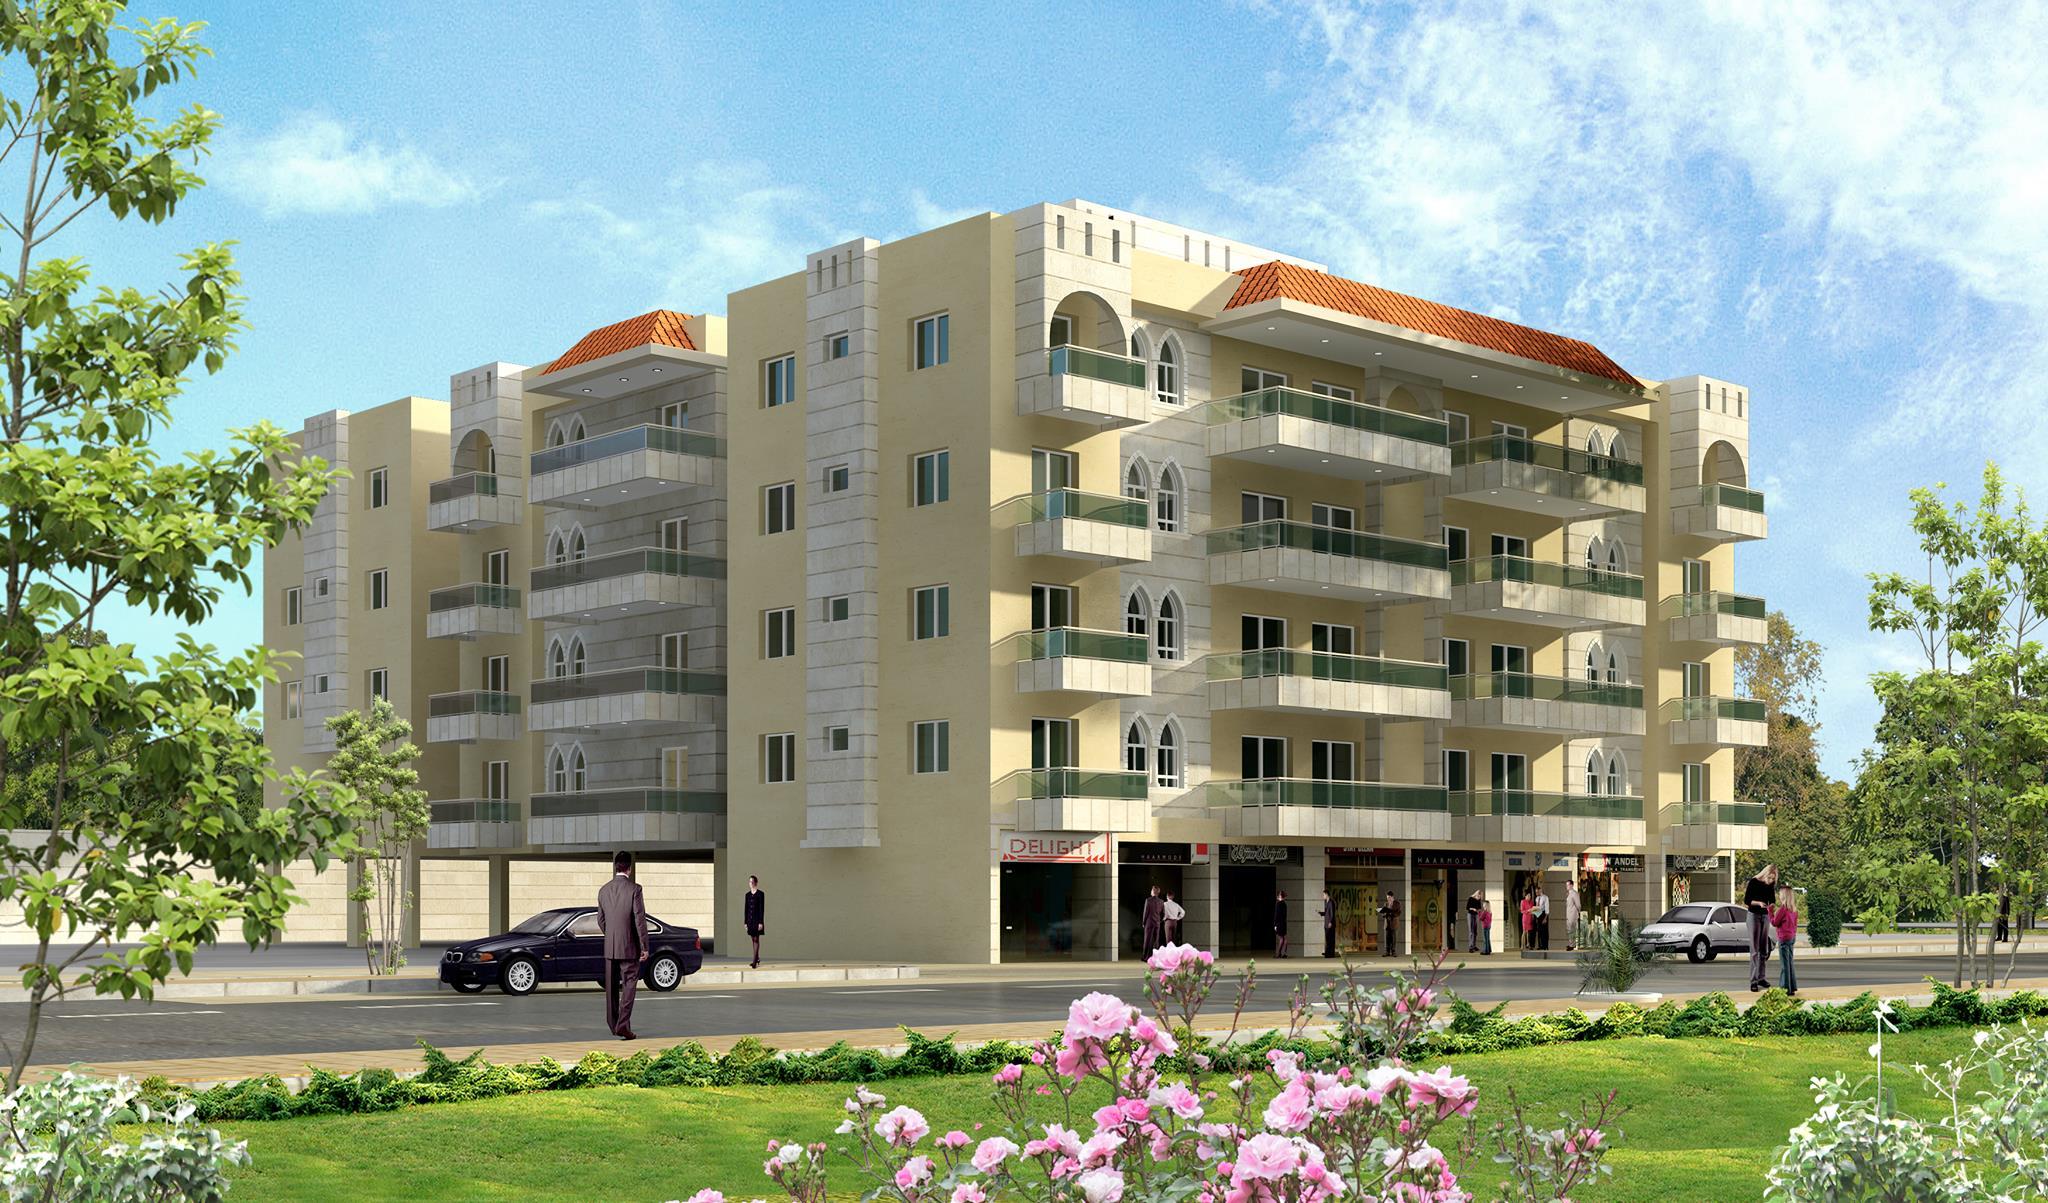 Al Saha Building - Kfarrouman